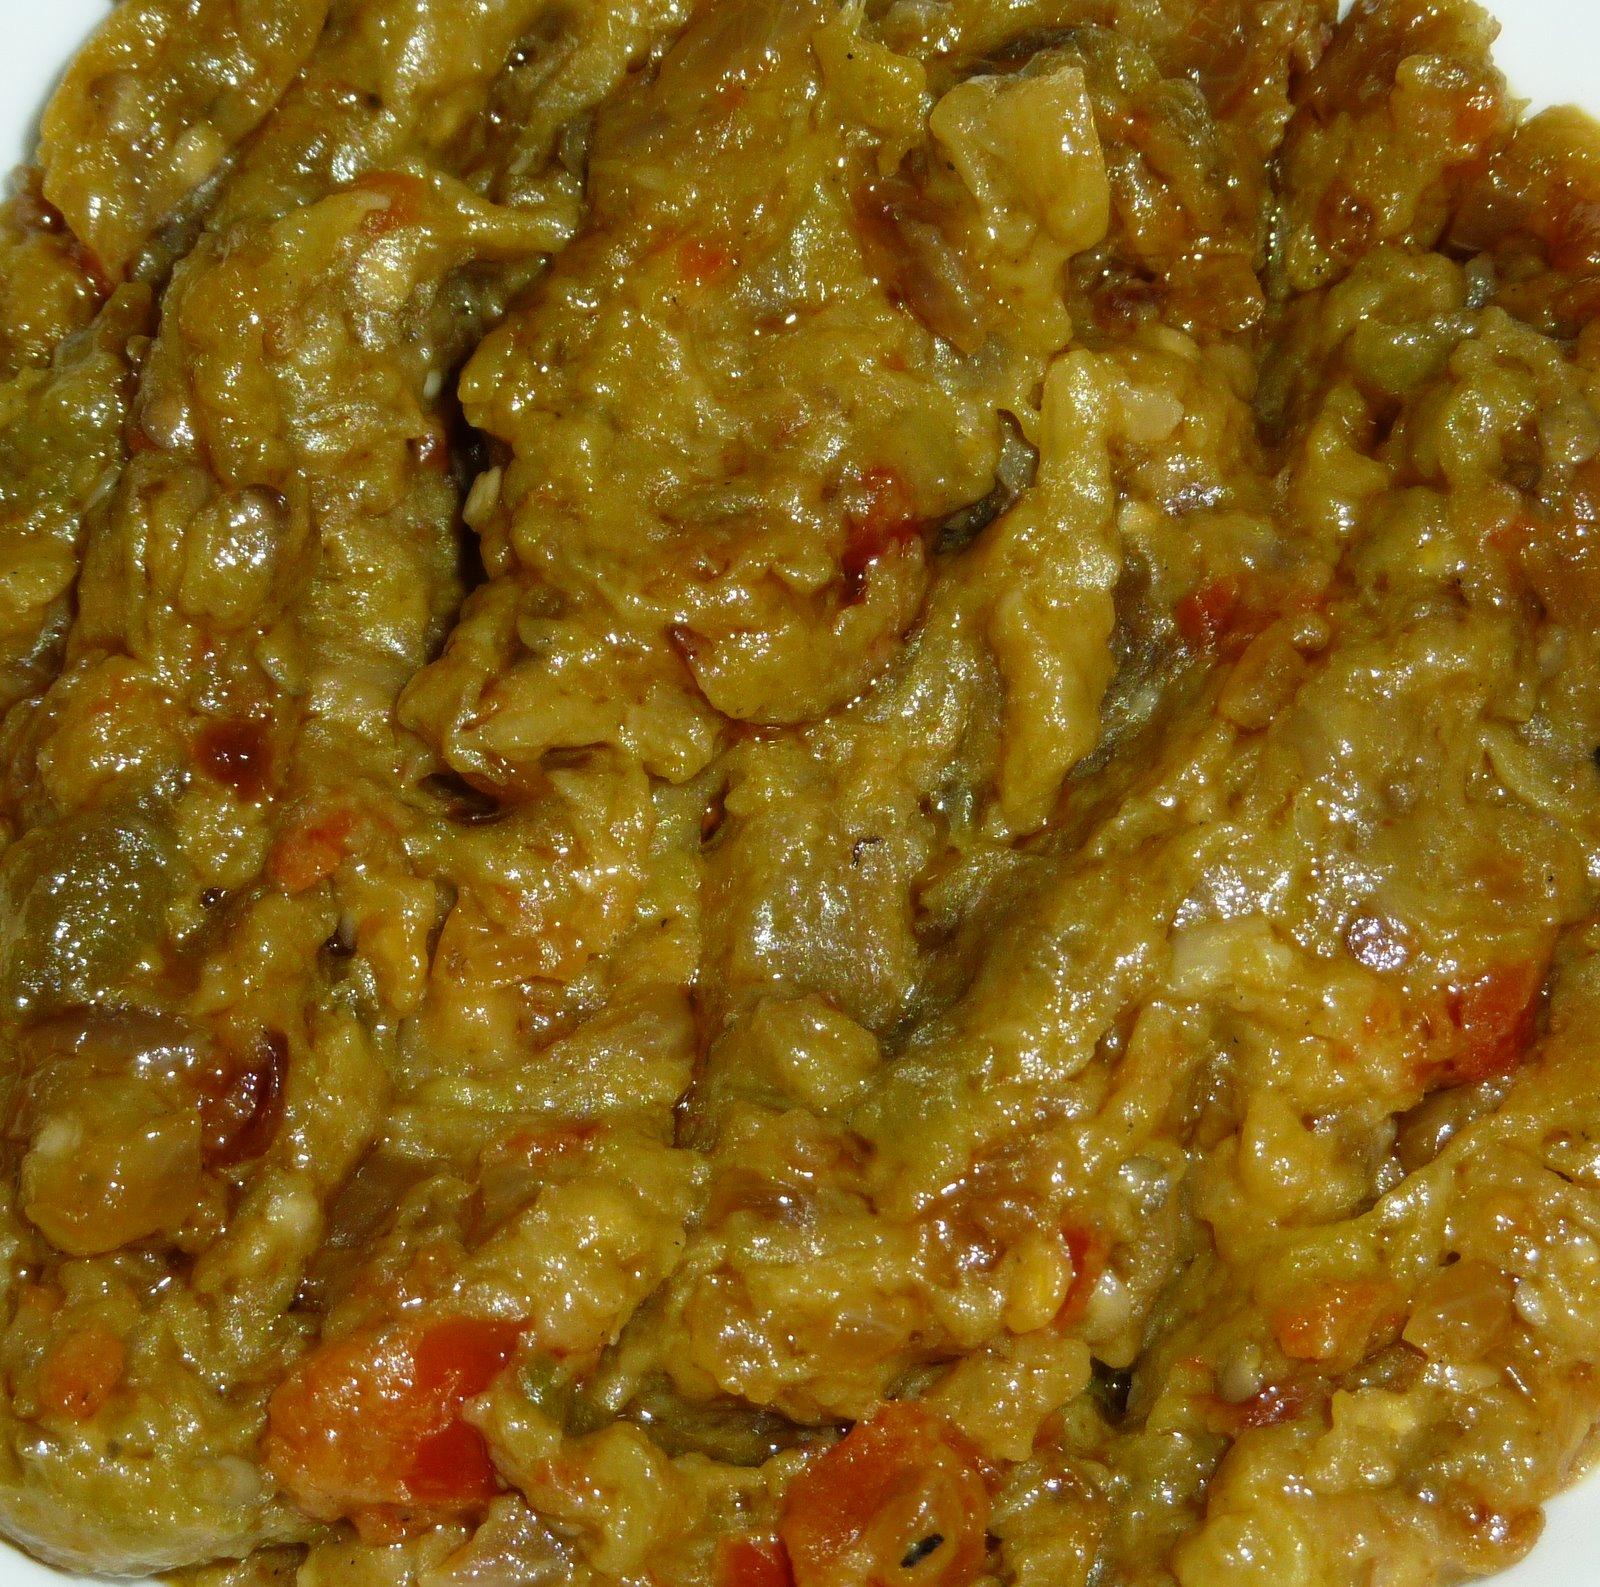 Begun Pora/Roasted Eggplant Recipe